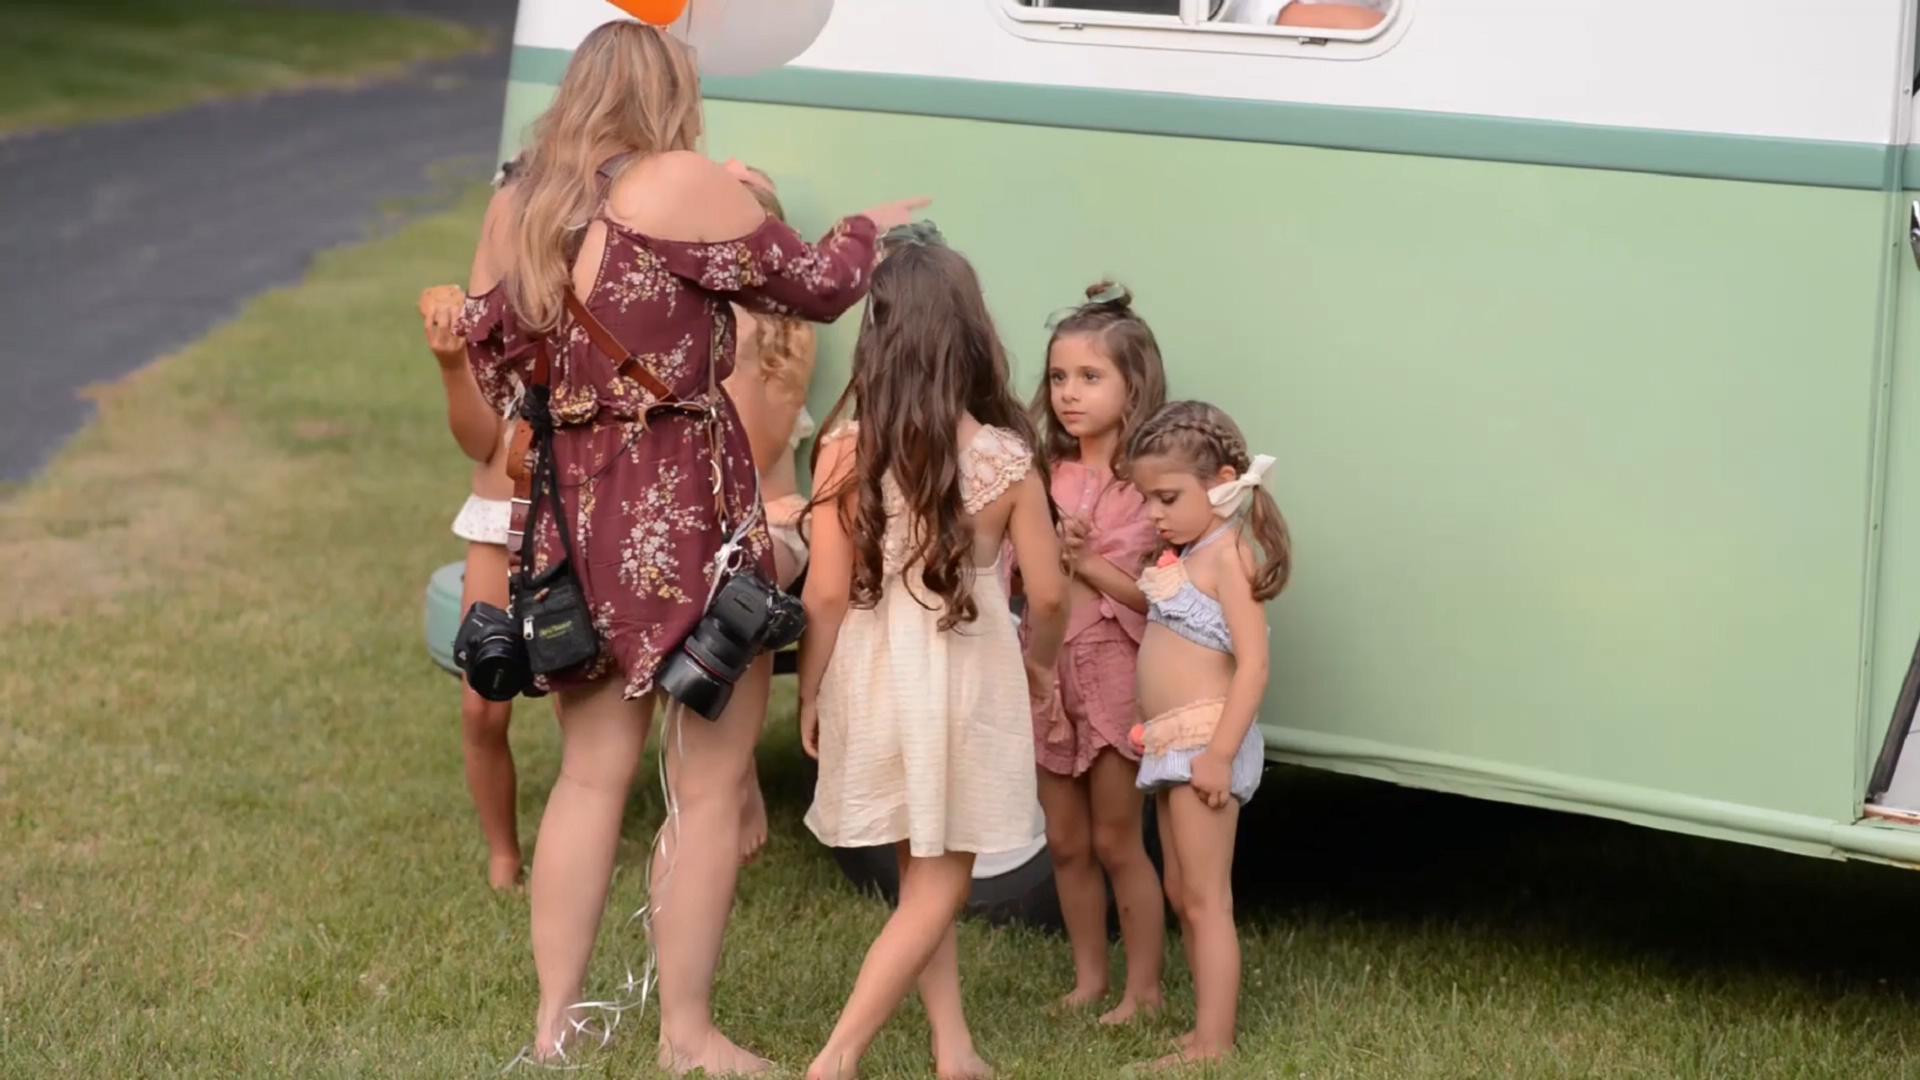 【S334】摄影师Stephanie Lemmon 策划一次儿童摄影主题拍摄全流程